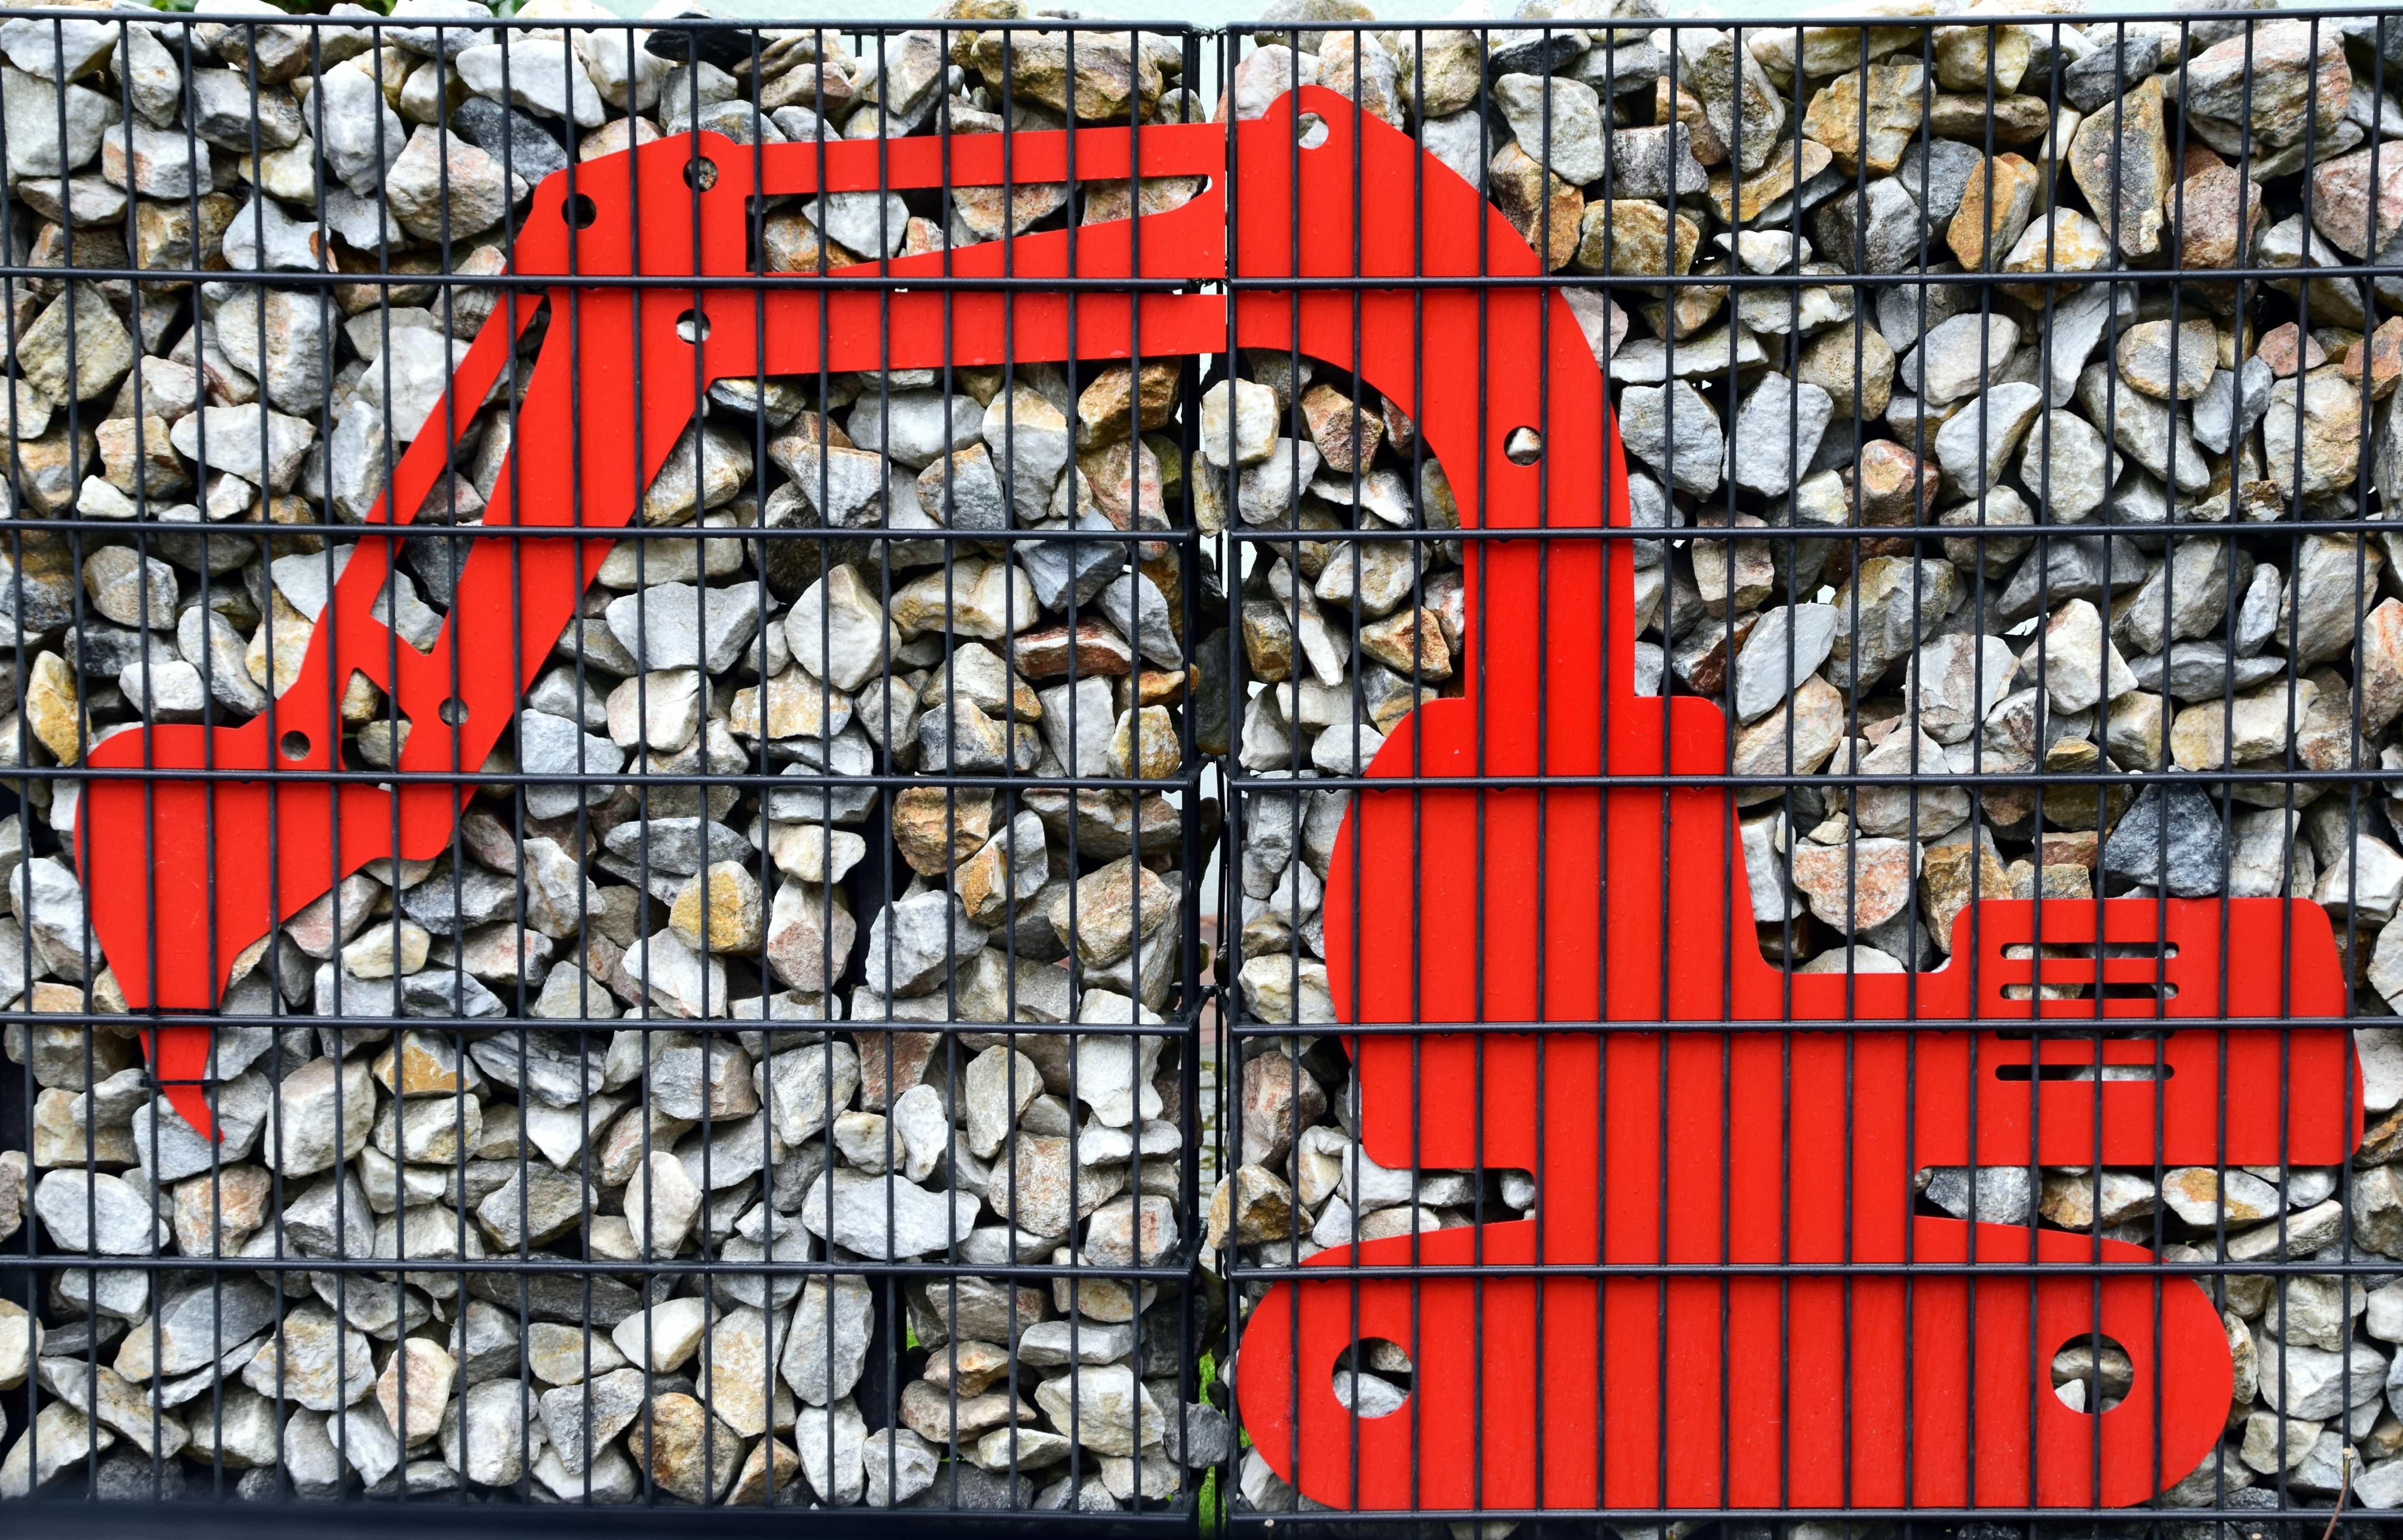 Kostenlose Bild Wand Stein Zaun Metall Gitter Bagger Kunst